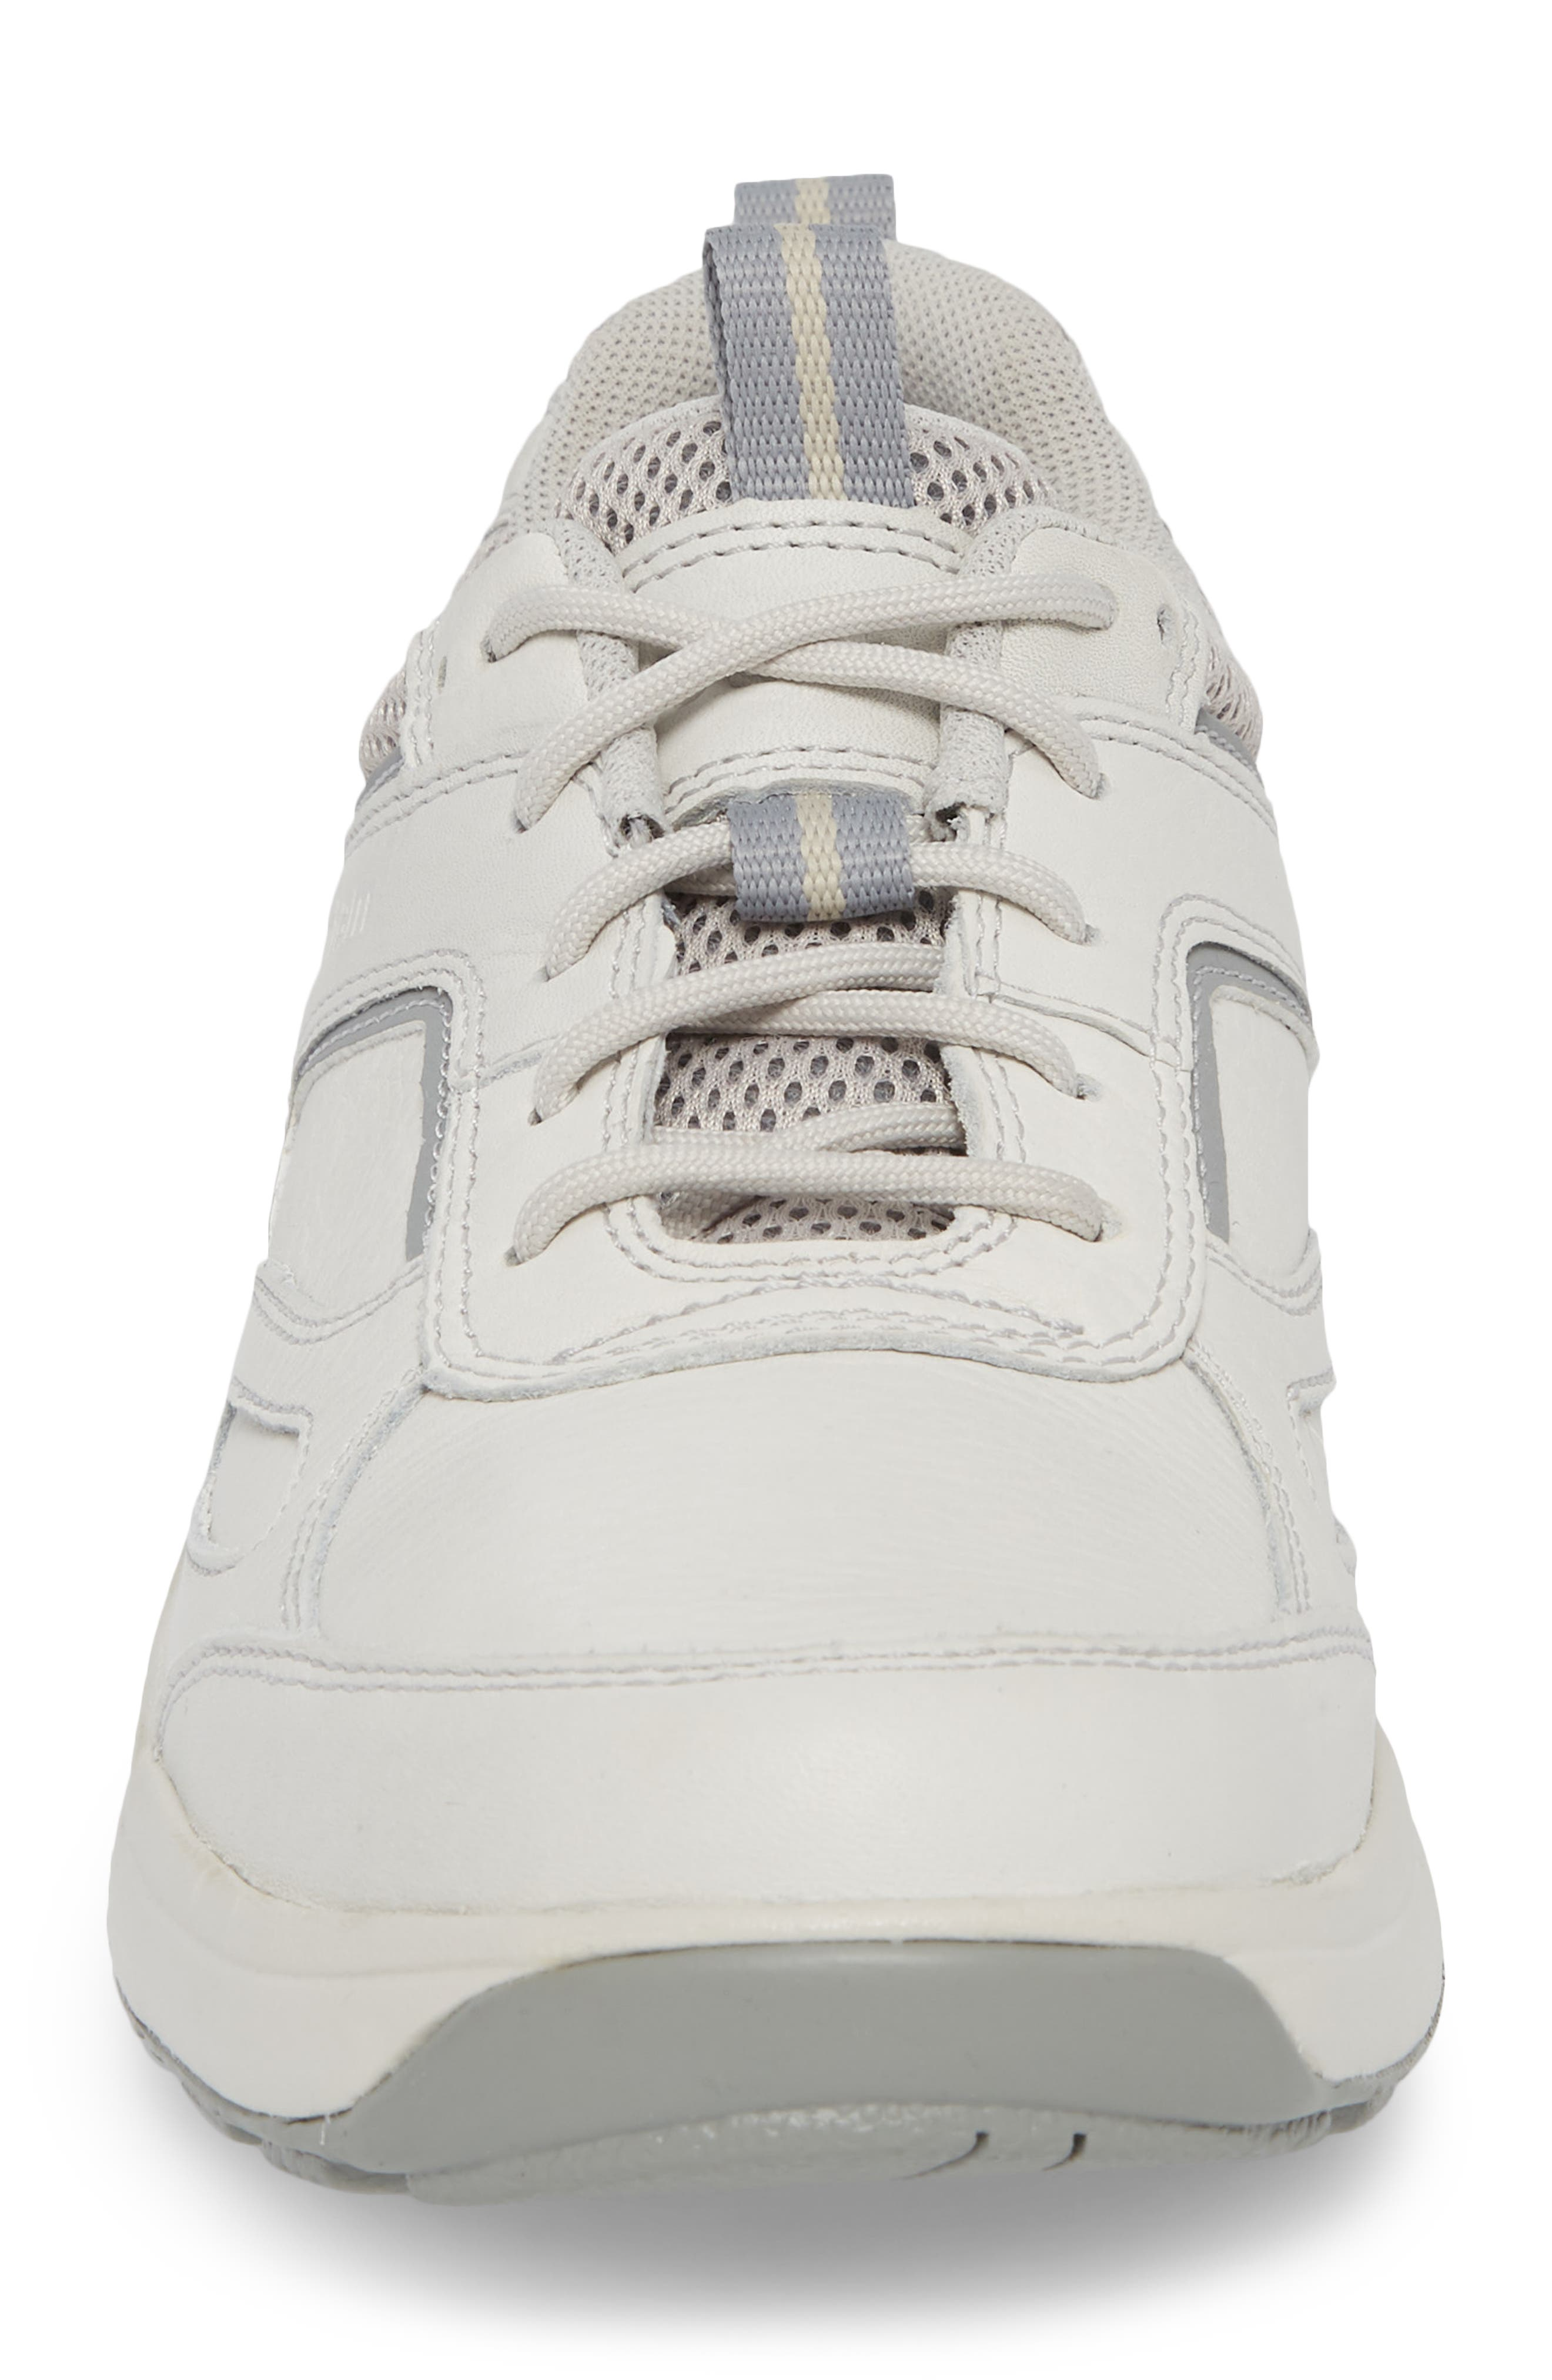 8000 Uball Sneaker,                             Alternate thumbnail 3, color,                             Off White Leather